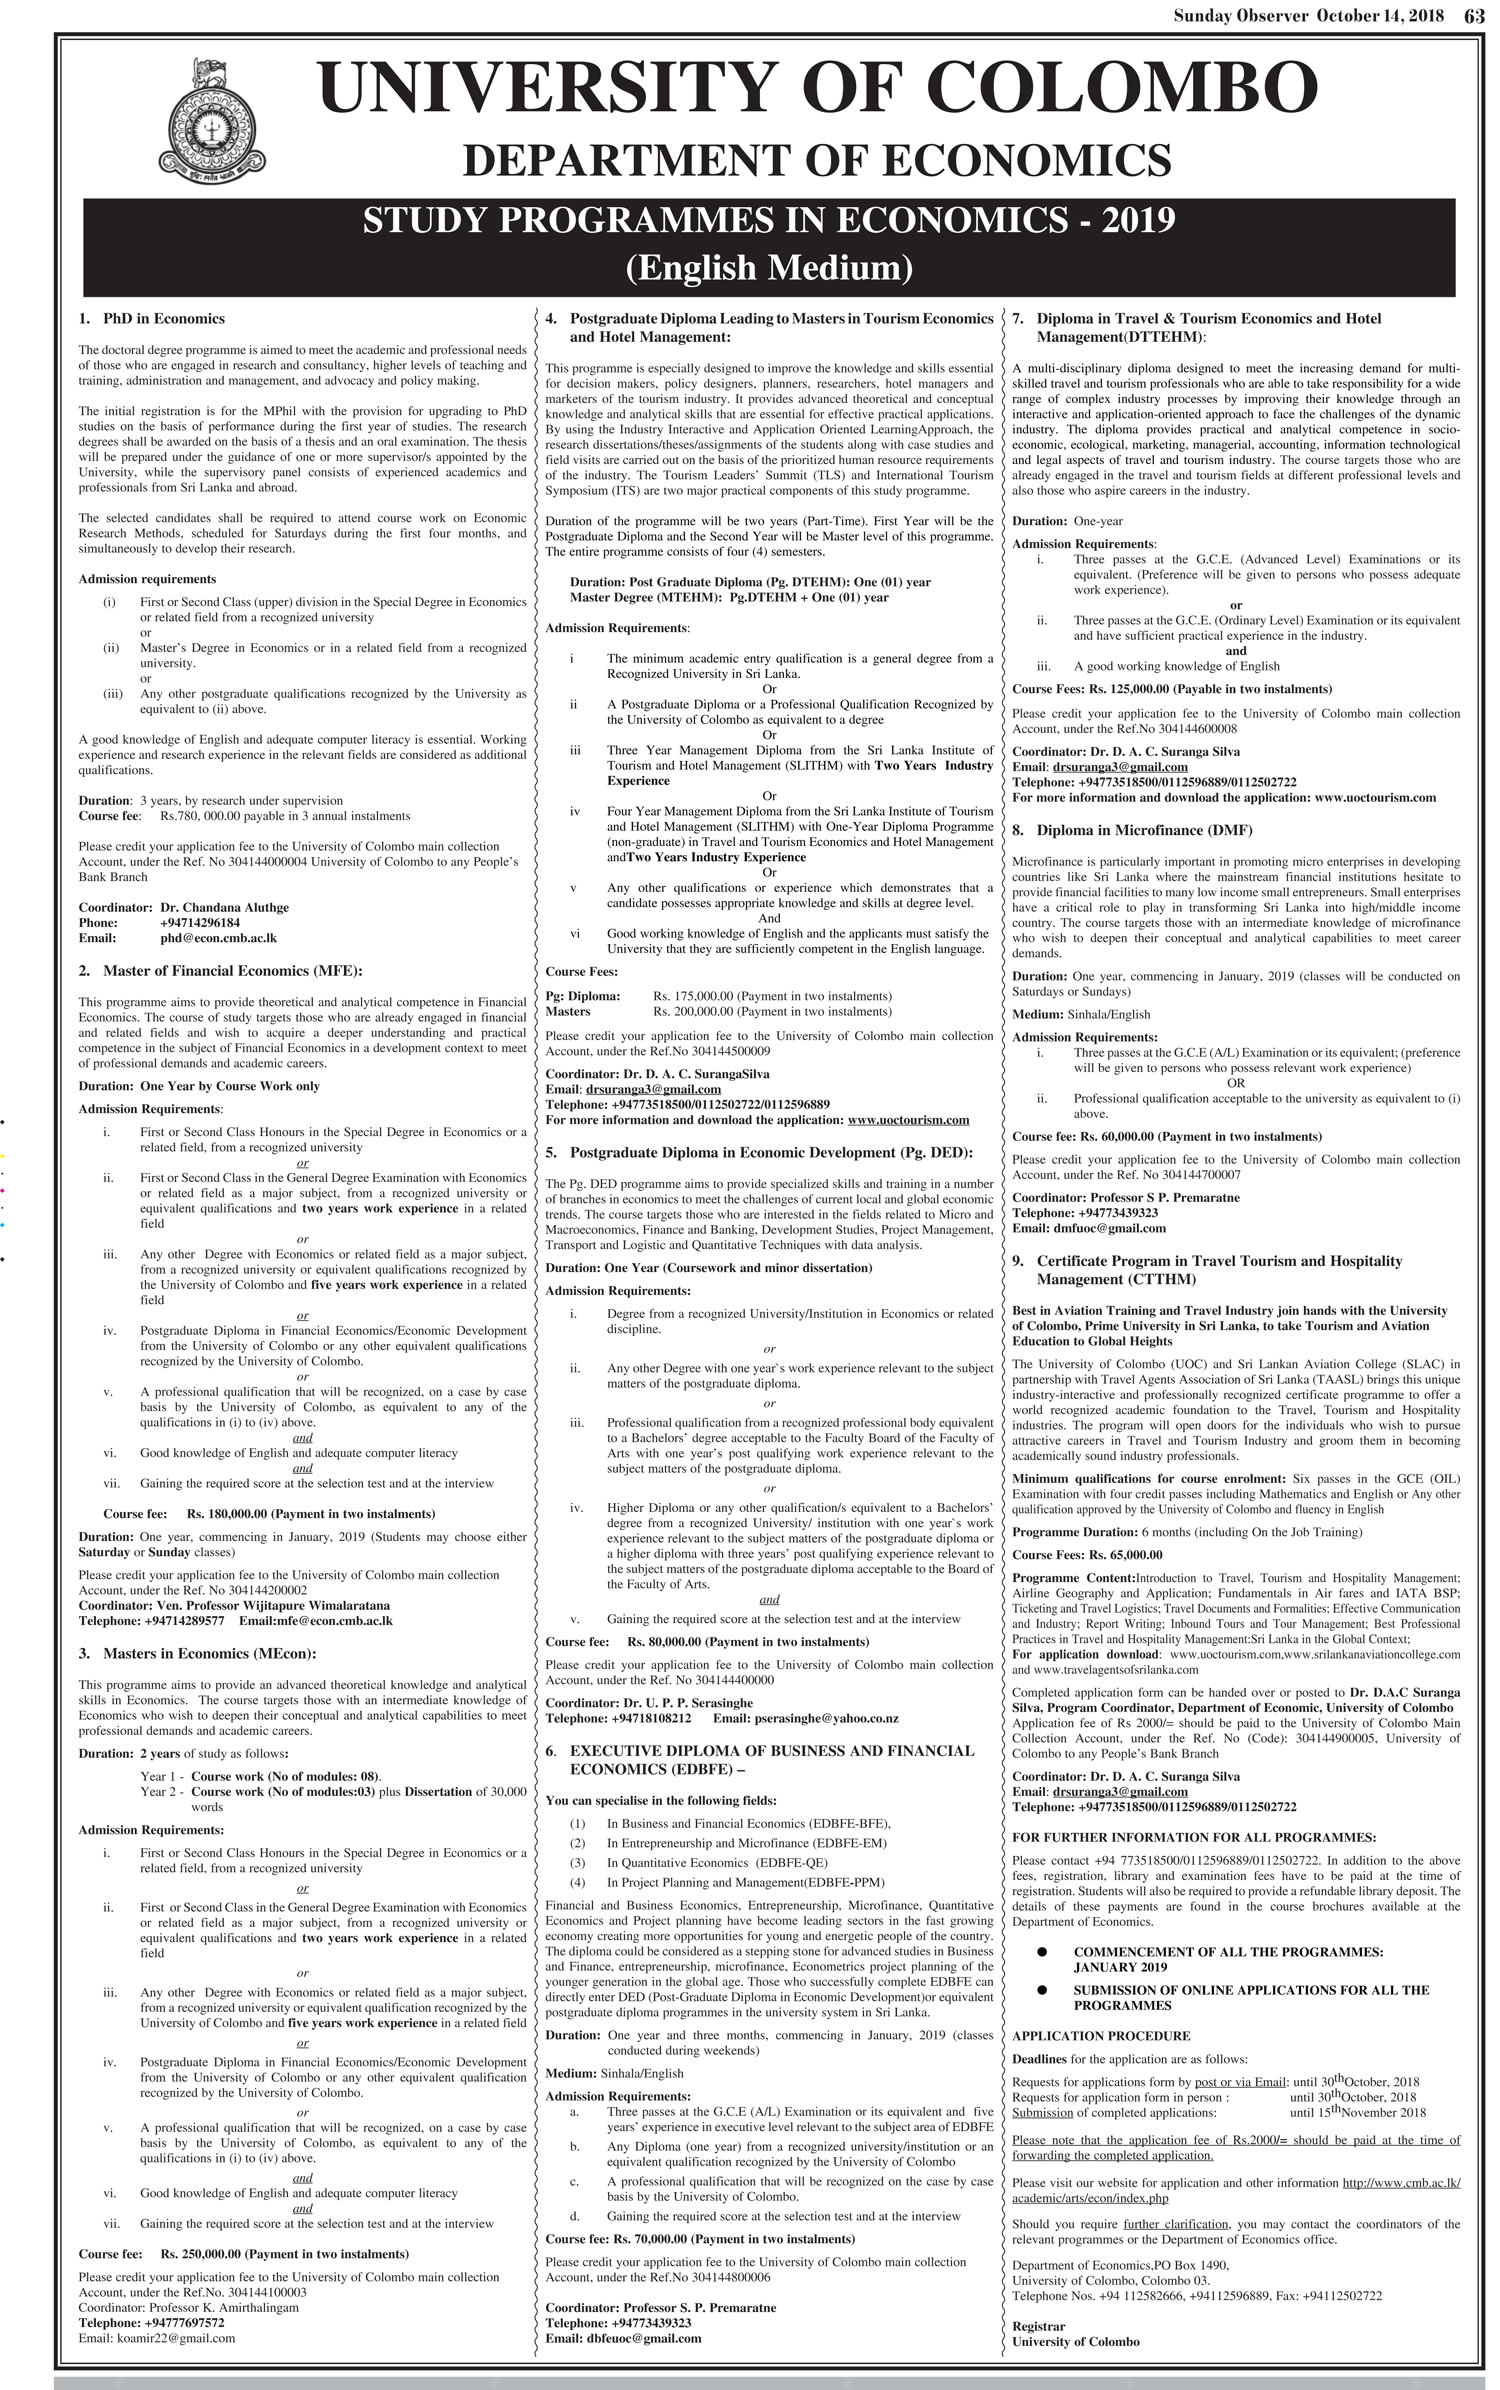 Study Programmes in Economics - Department of Economics - University of Colombo